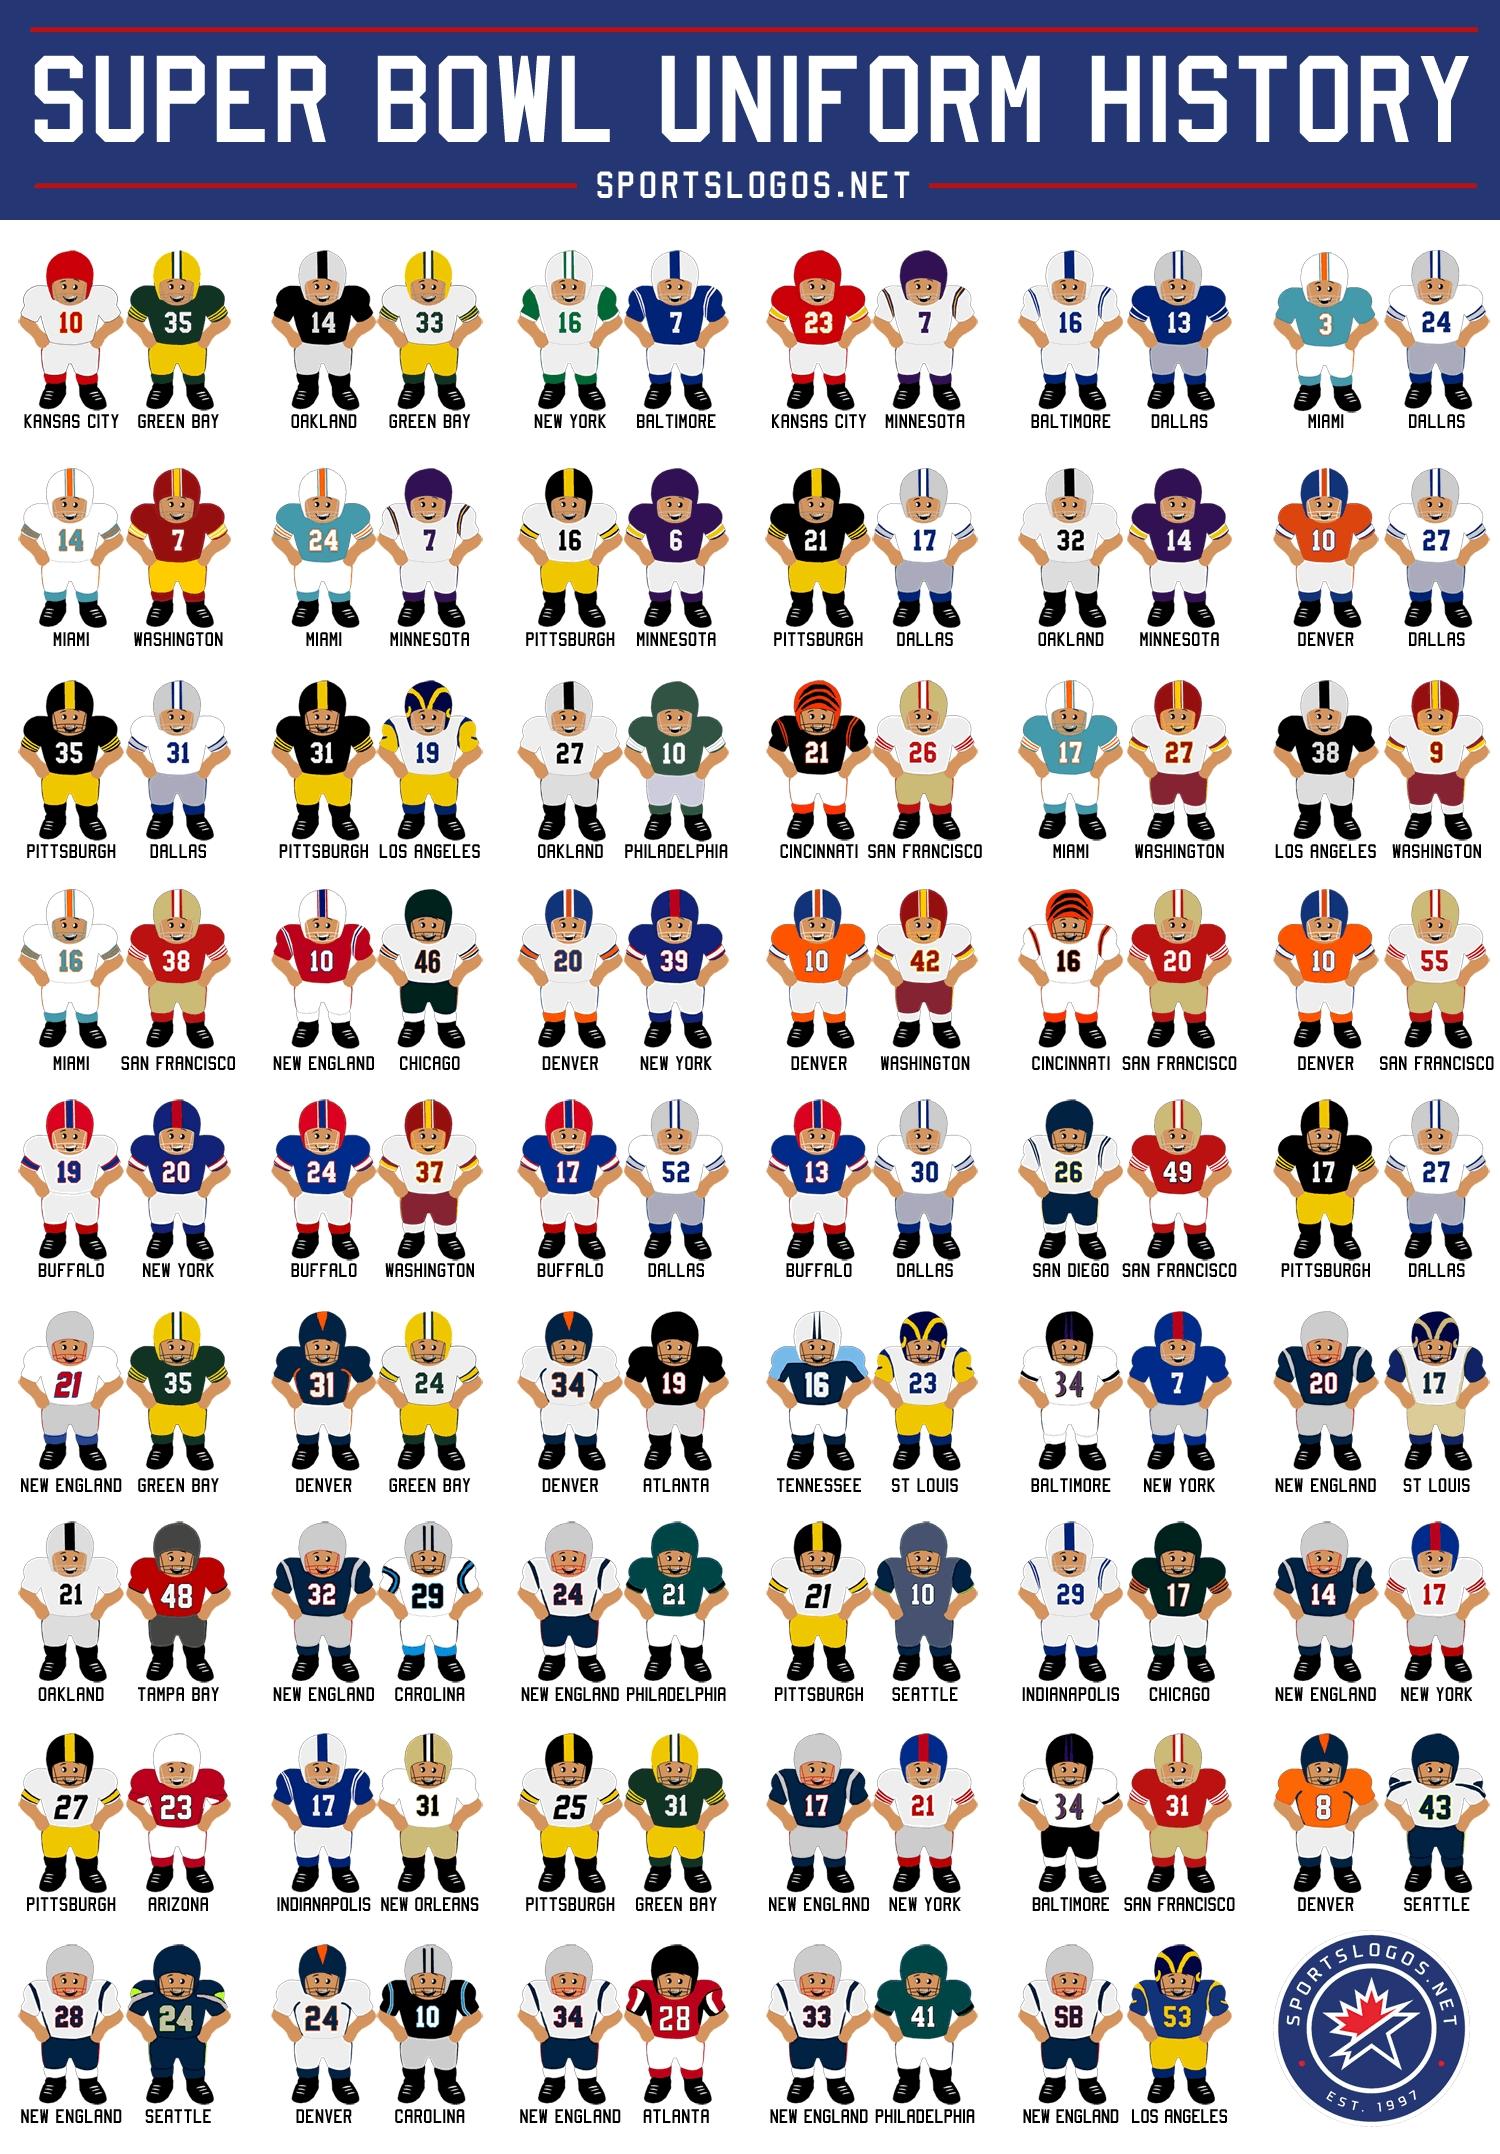 Complete Super Bowl Uniform History: Cartoon Edition | Chris in Last 10 Super Bowls